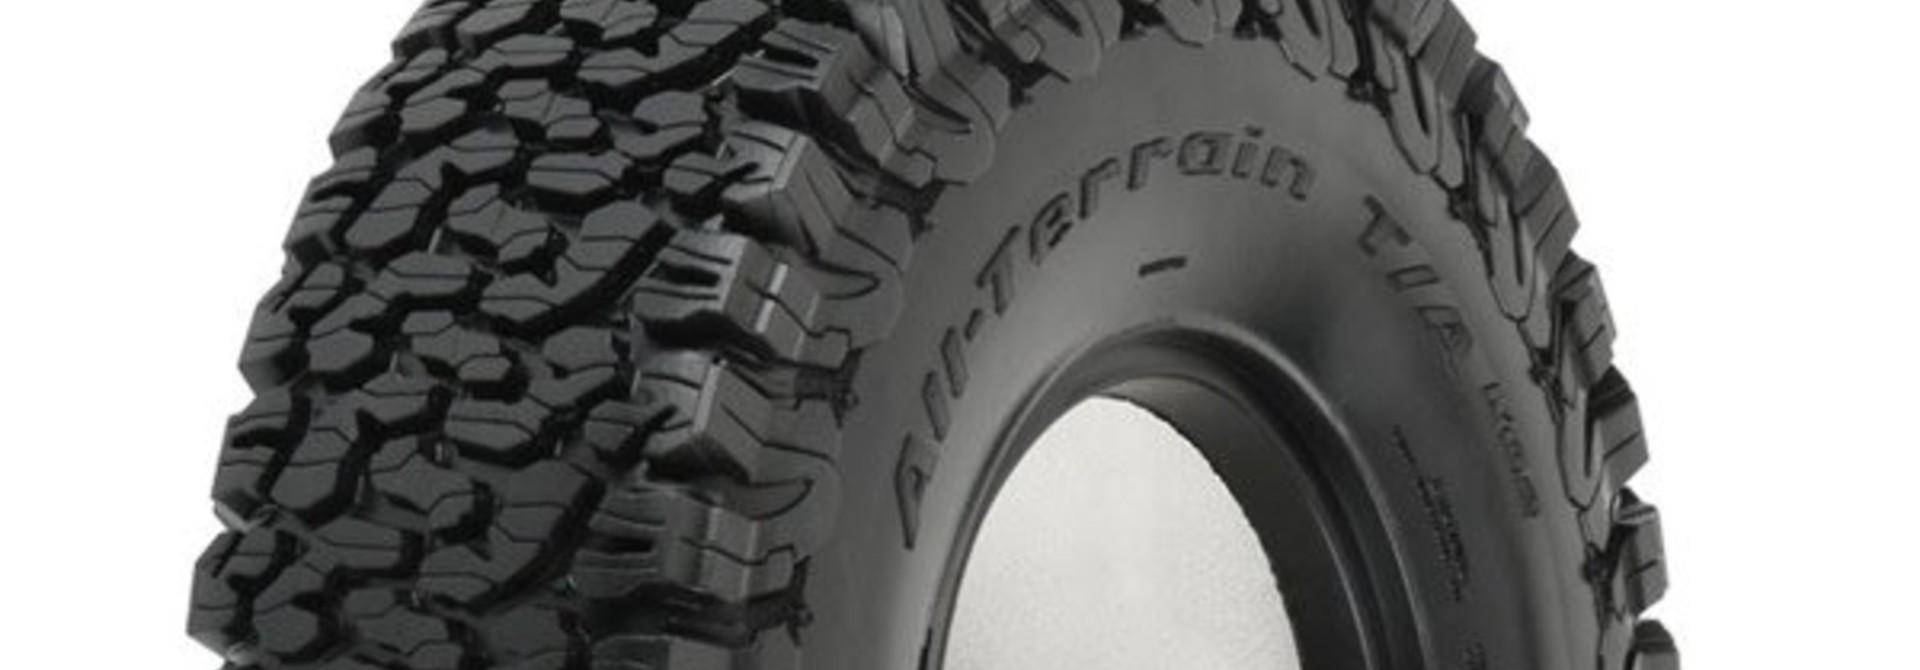 "BFG All-Terrain KO2 1.9"" G8 Rock Truck Tires (2) F/R"